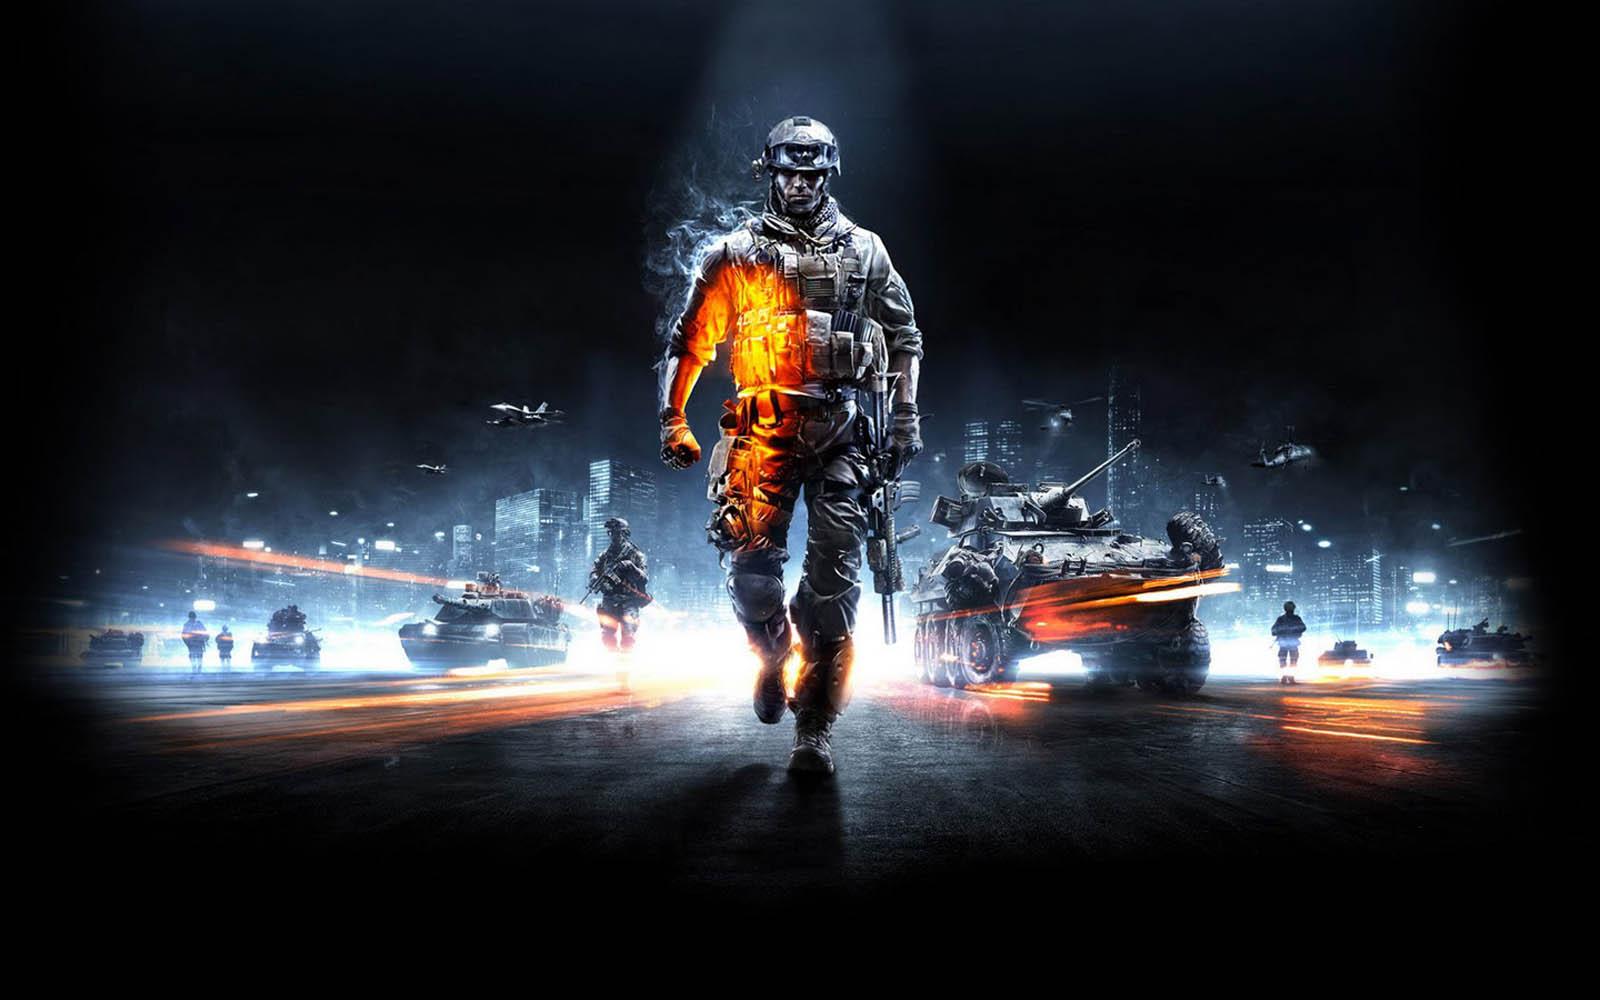 Desktop Wallpaper Video Games